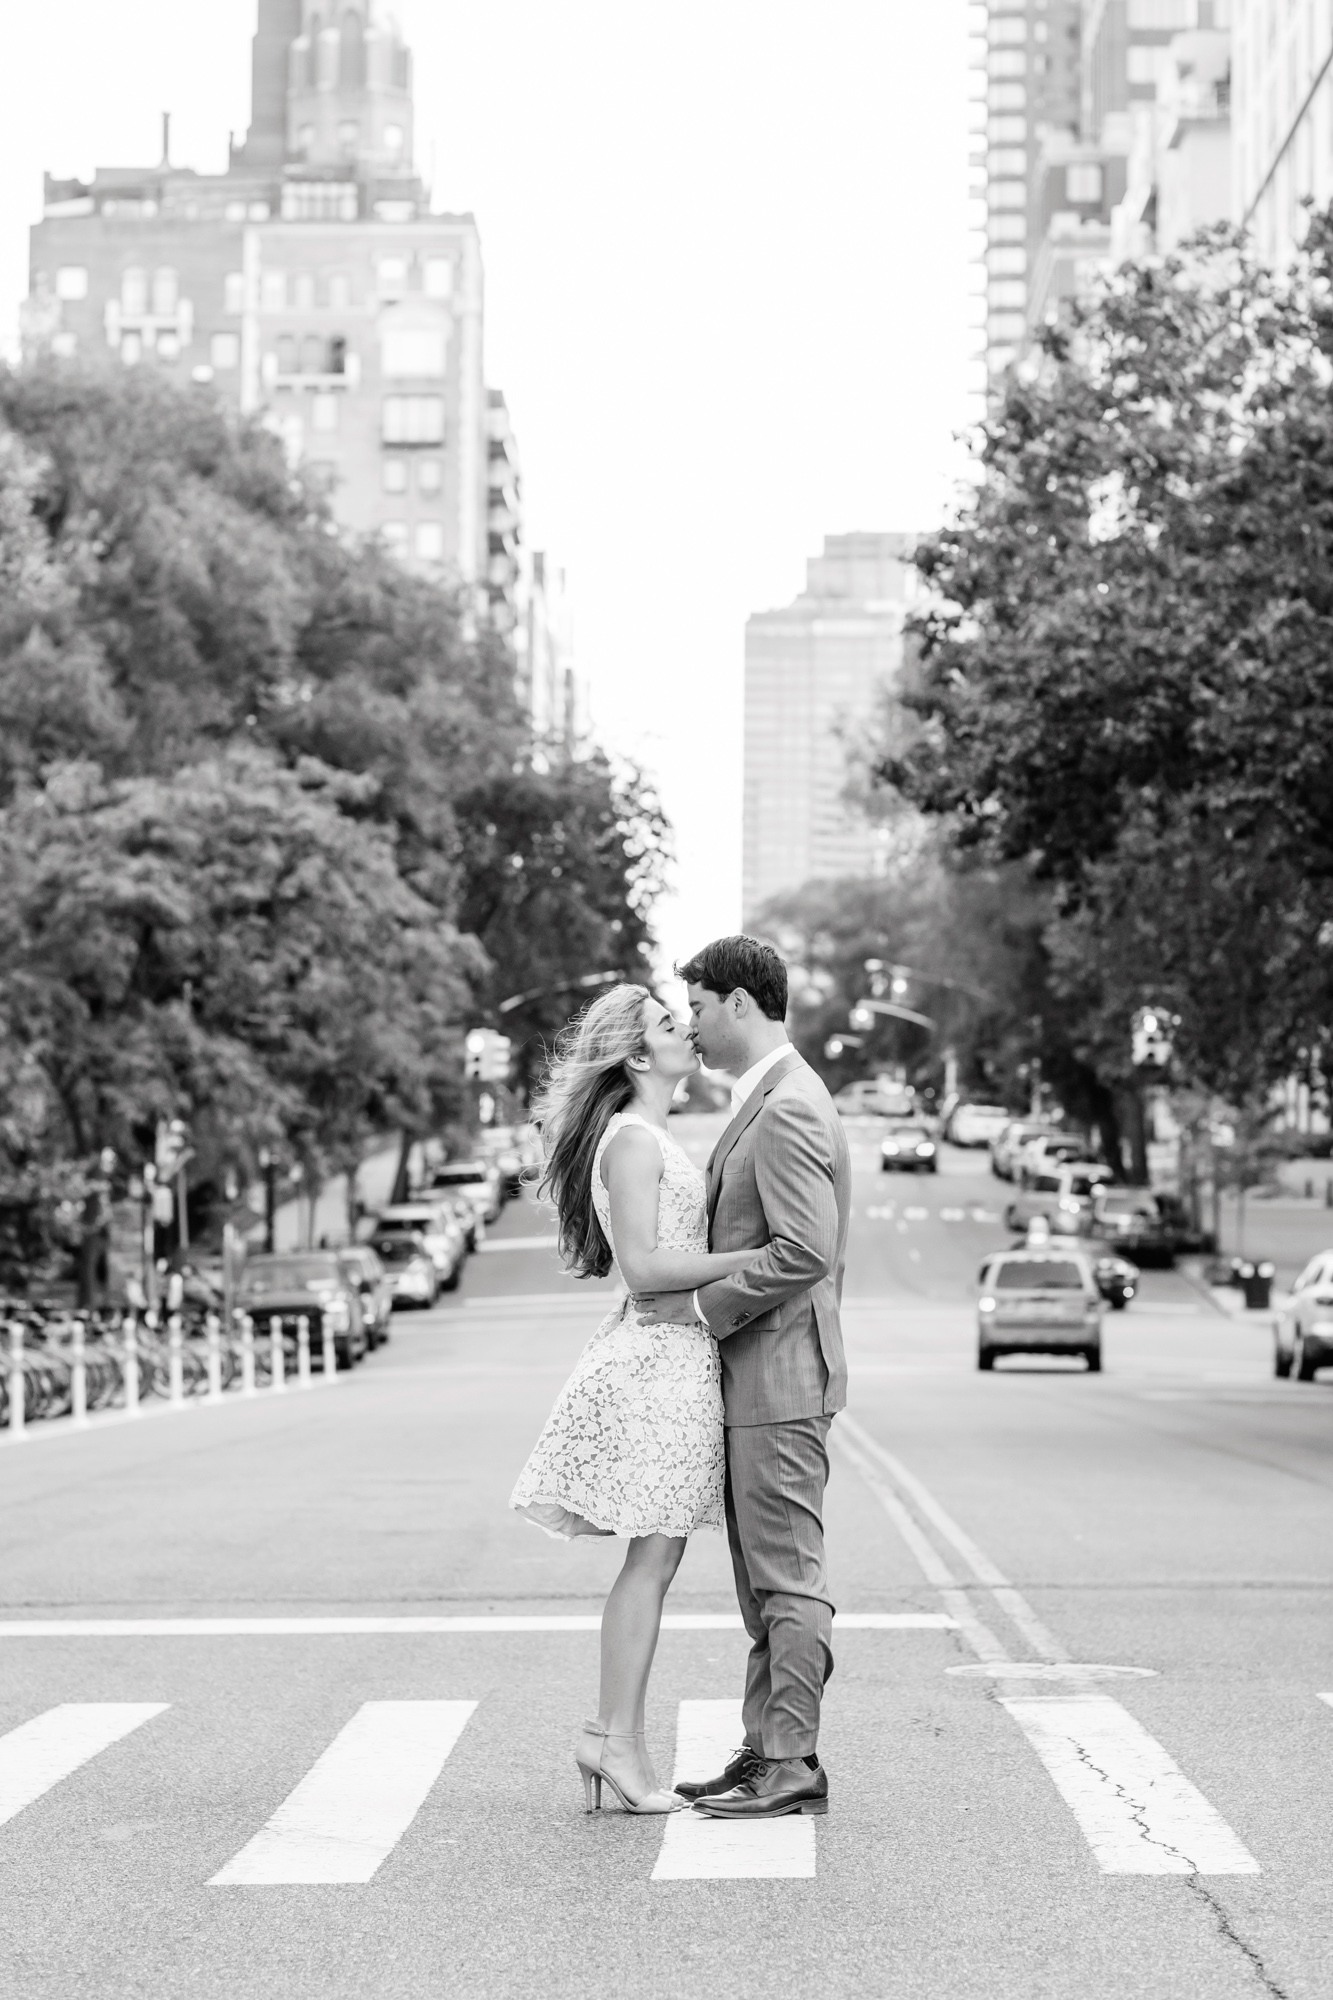 06_Christina_Daniel_Carl_Schurz_Park_Engagement_NYC_Tanya_Salazar_Phototgraphy_075.jpg